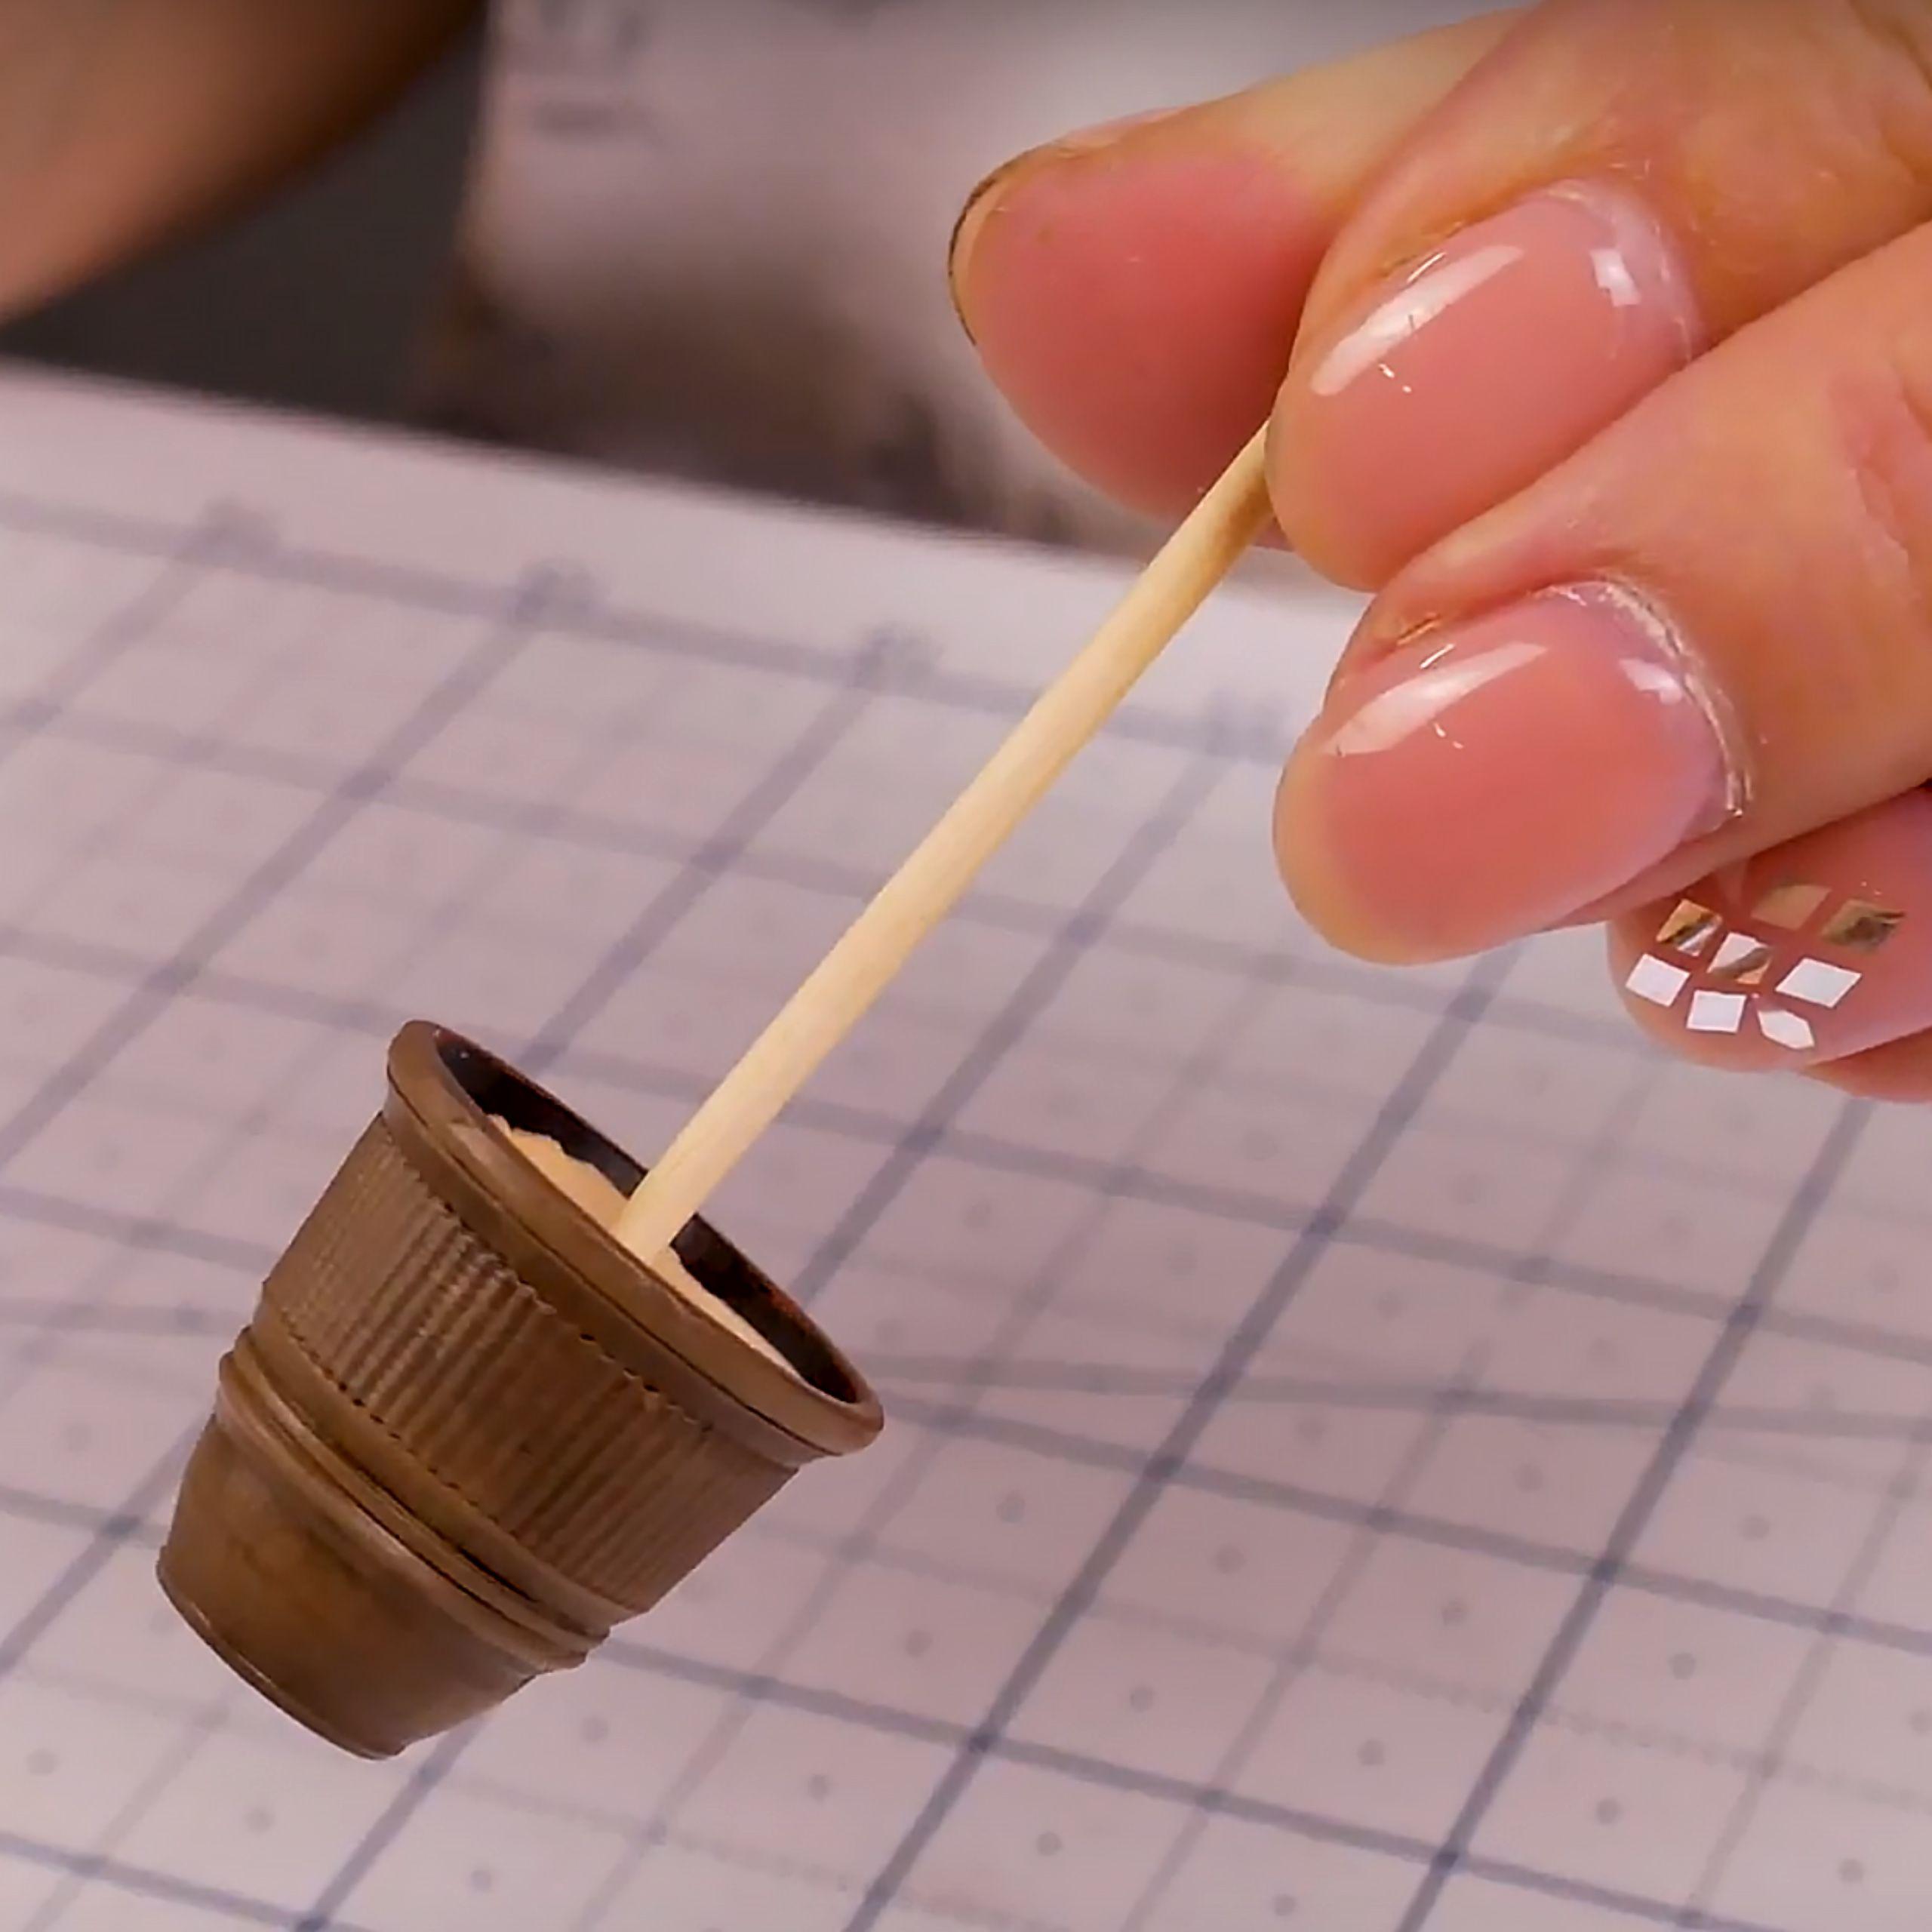 How to Make Amazing miniature Flower pot #5minutecraftsvideos